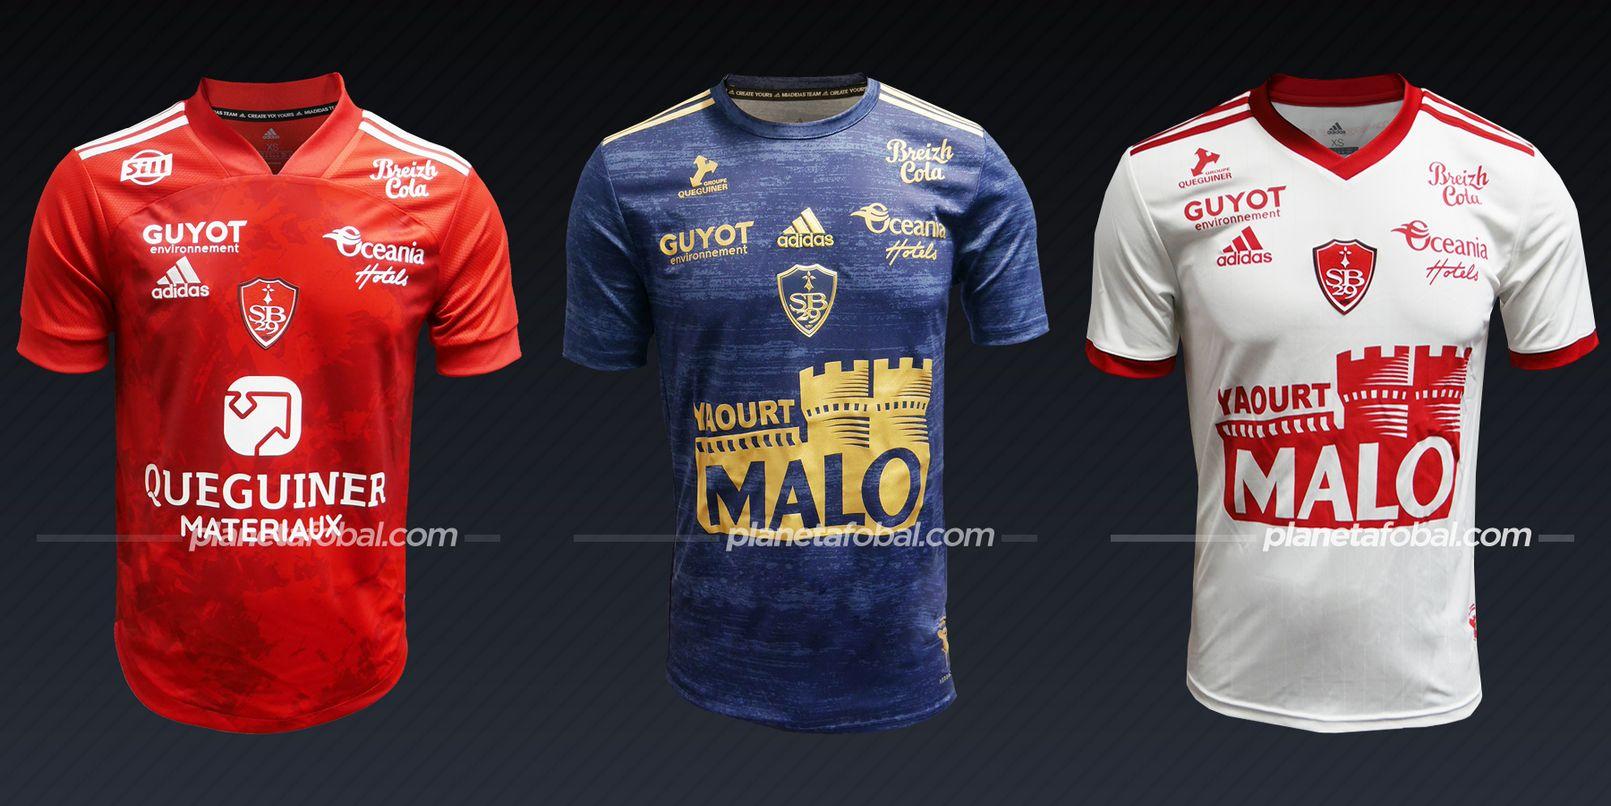 Stade Brestois 29 | Camisetas de la Ligue 1 2020/2021